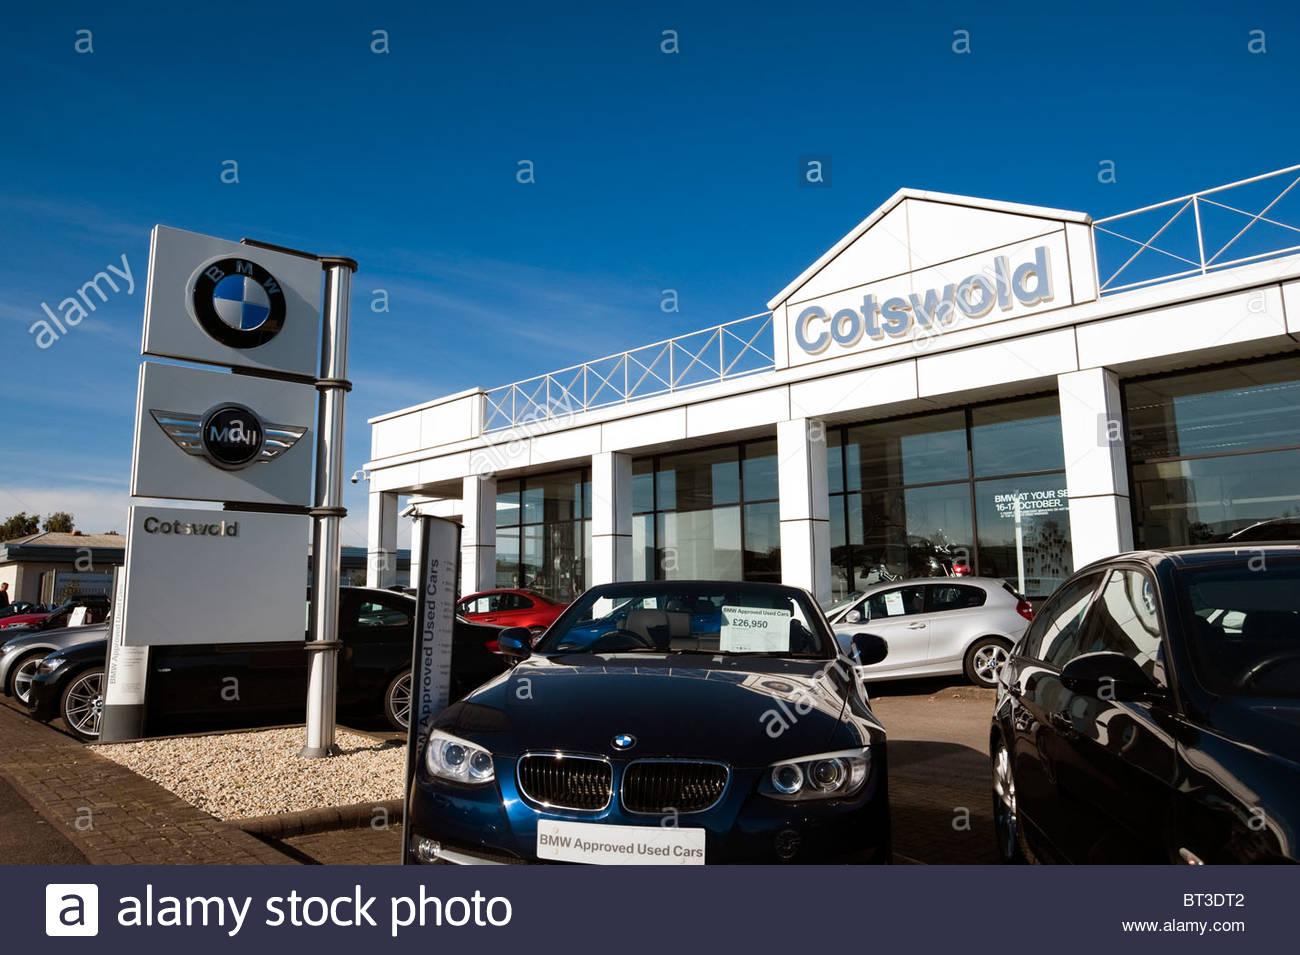 bmw mini cotswold car dealership in cheltenham uk used bmw cars on stock photo 32038834 alamy. Black Bedroom Furniture Sets. Home Design Ideas